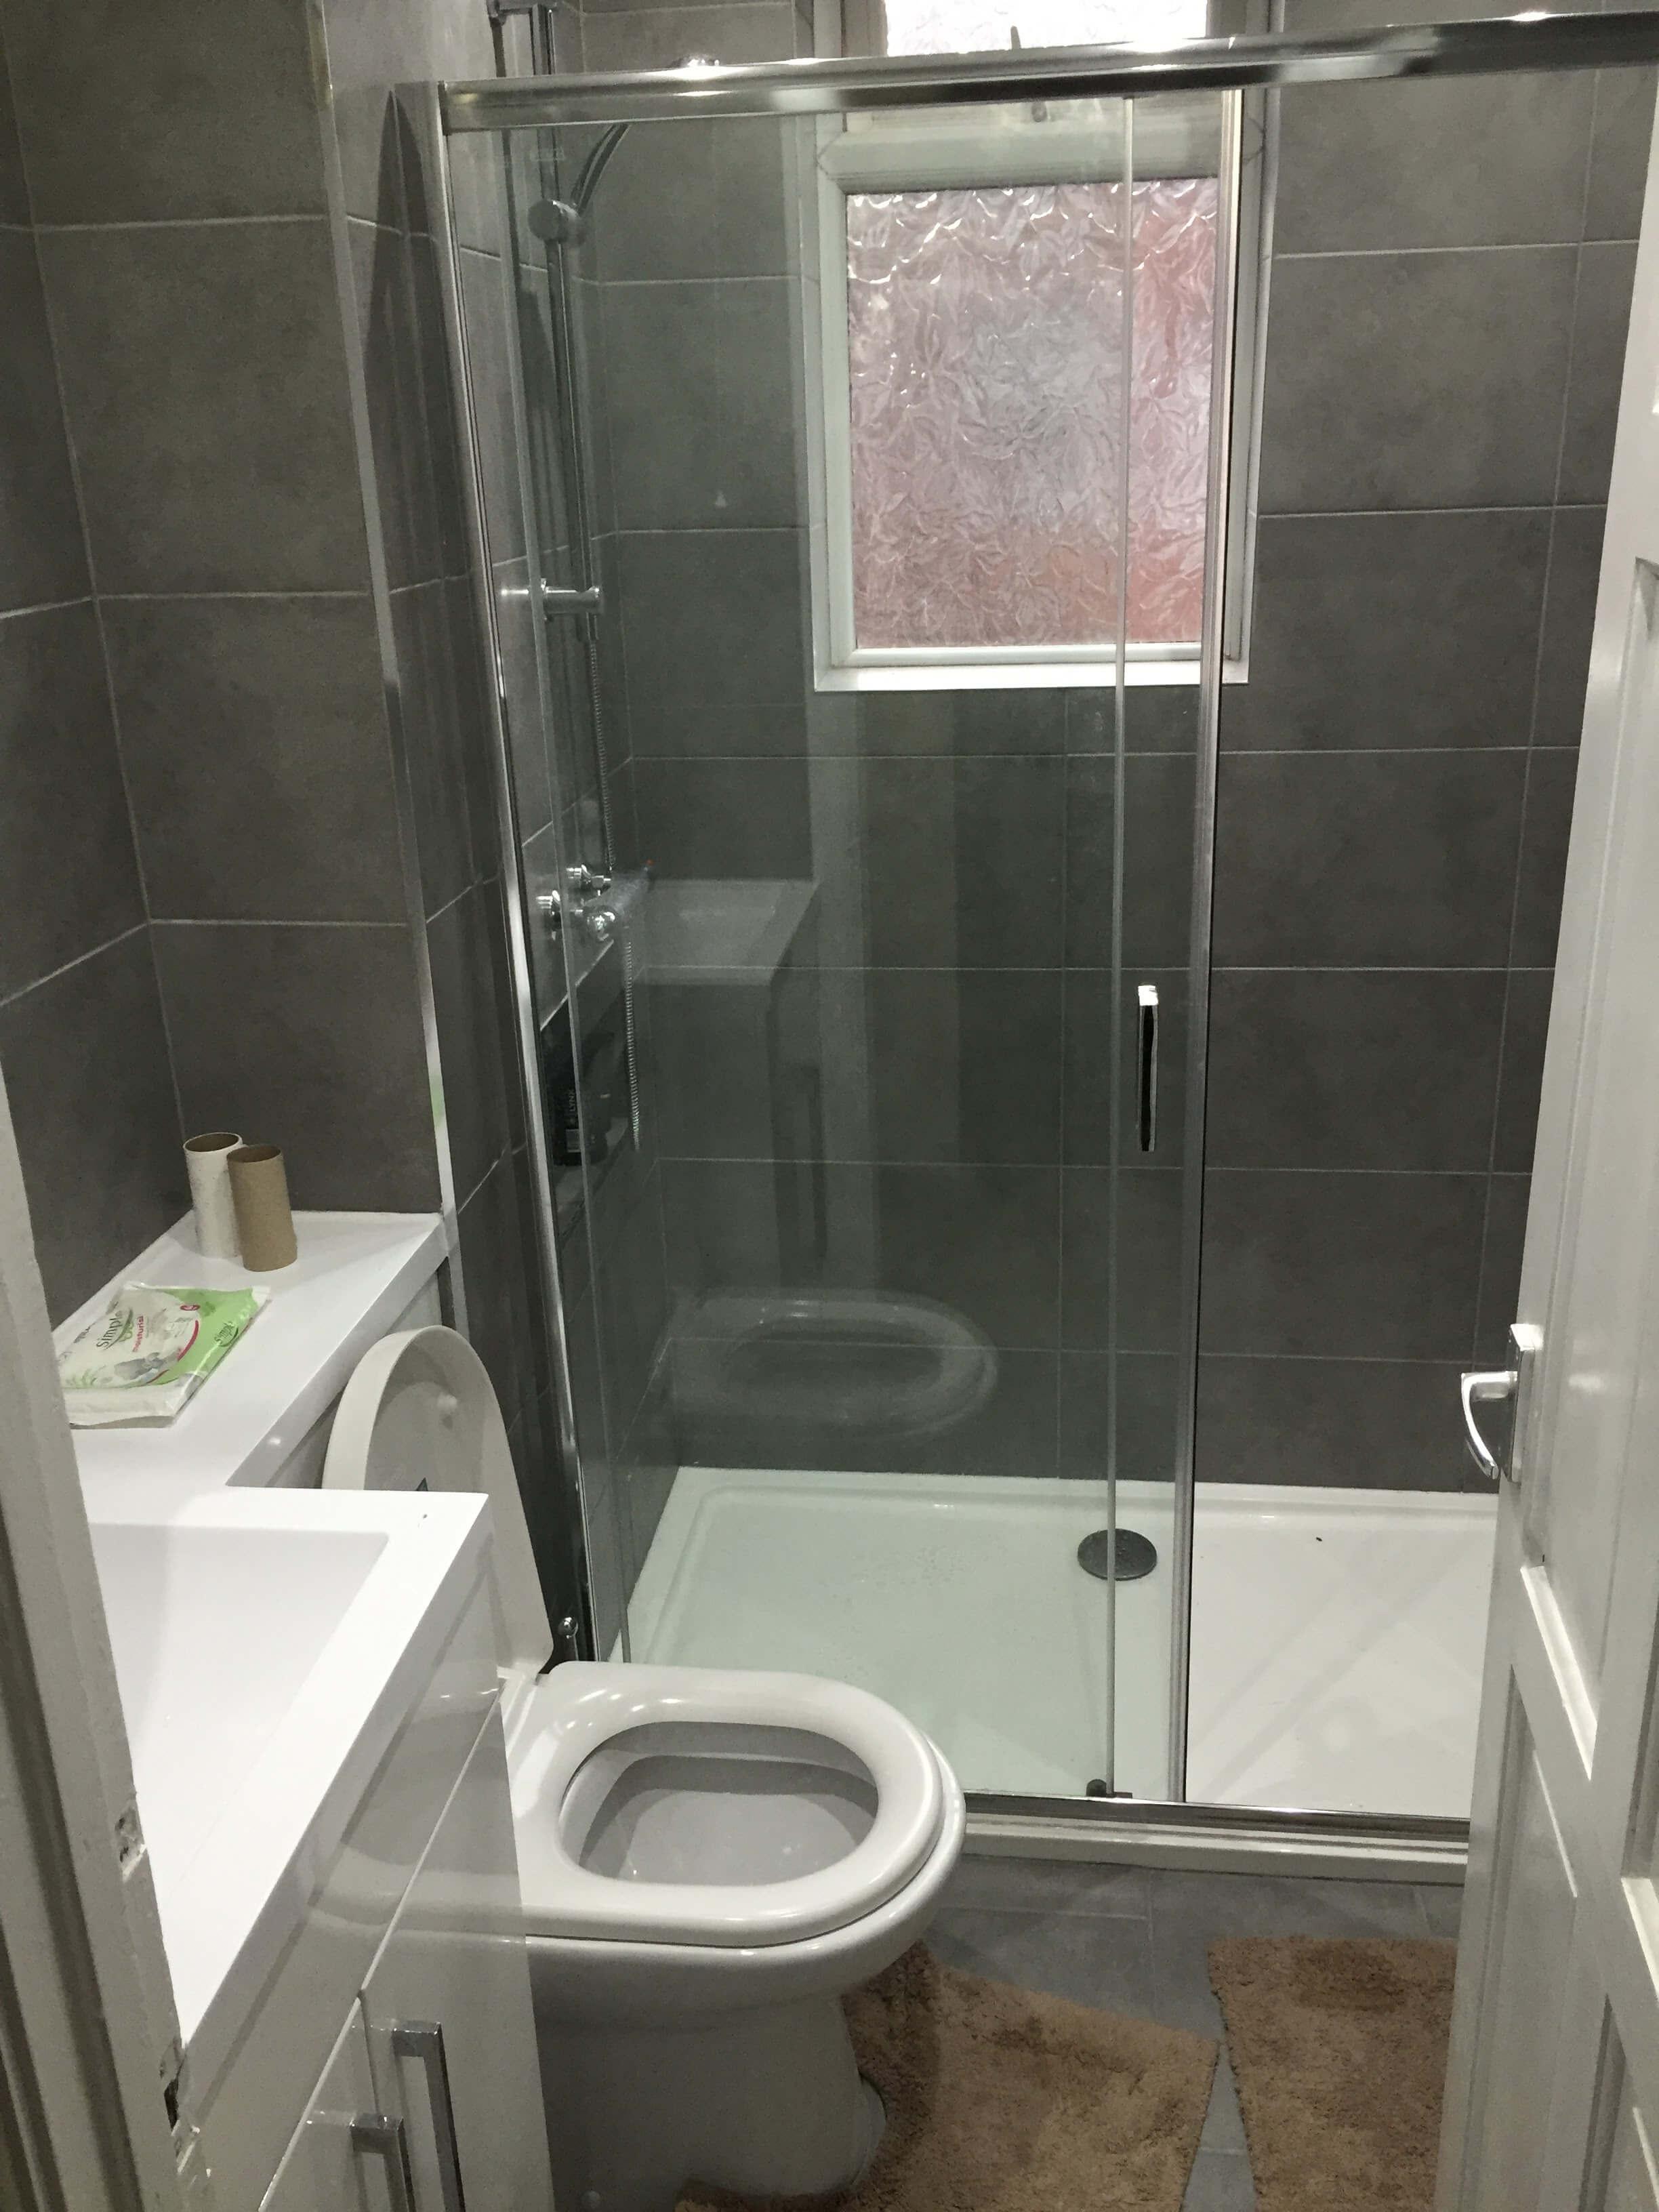 Dark grey tiled bathroom